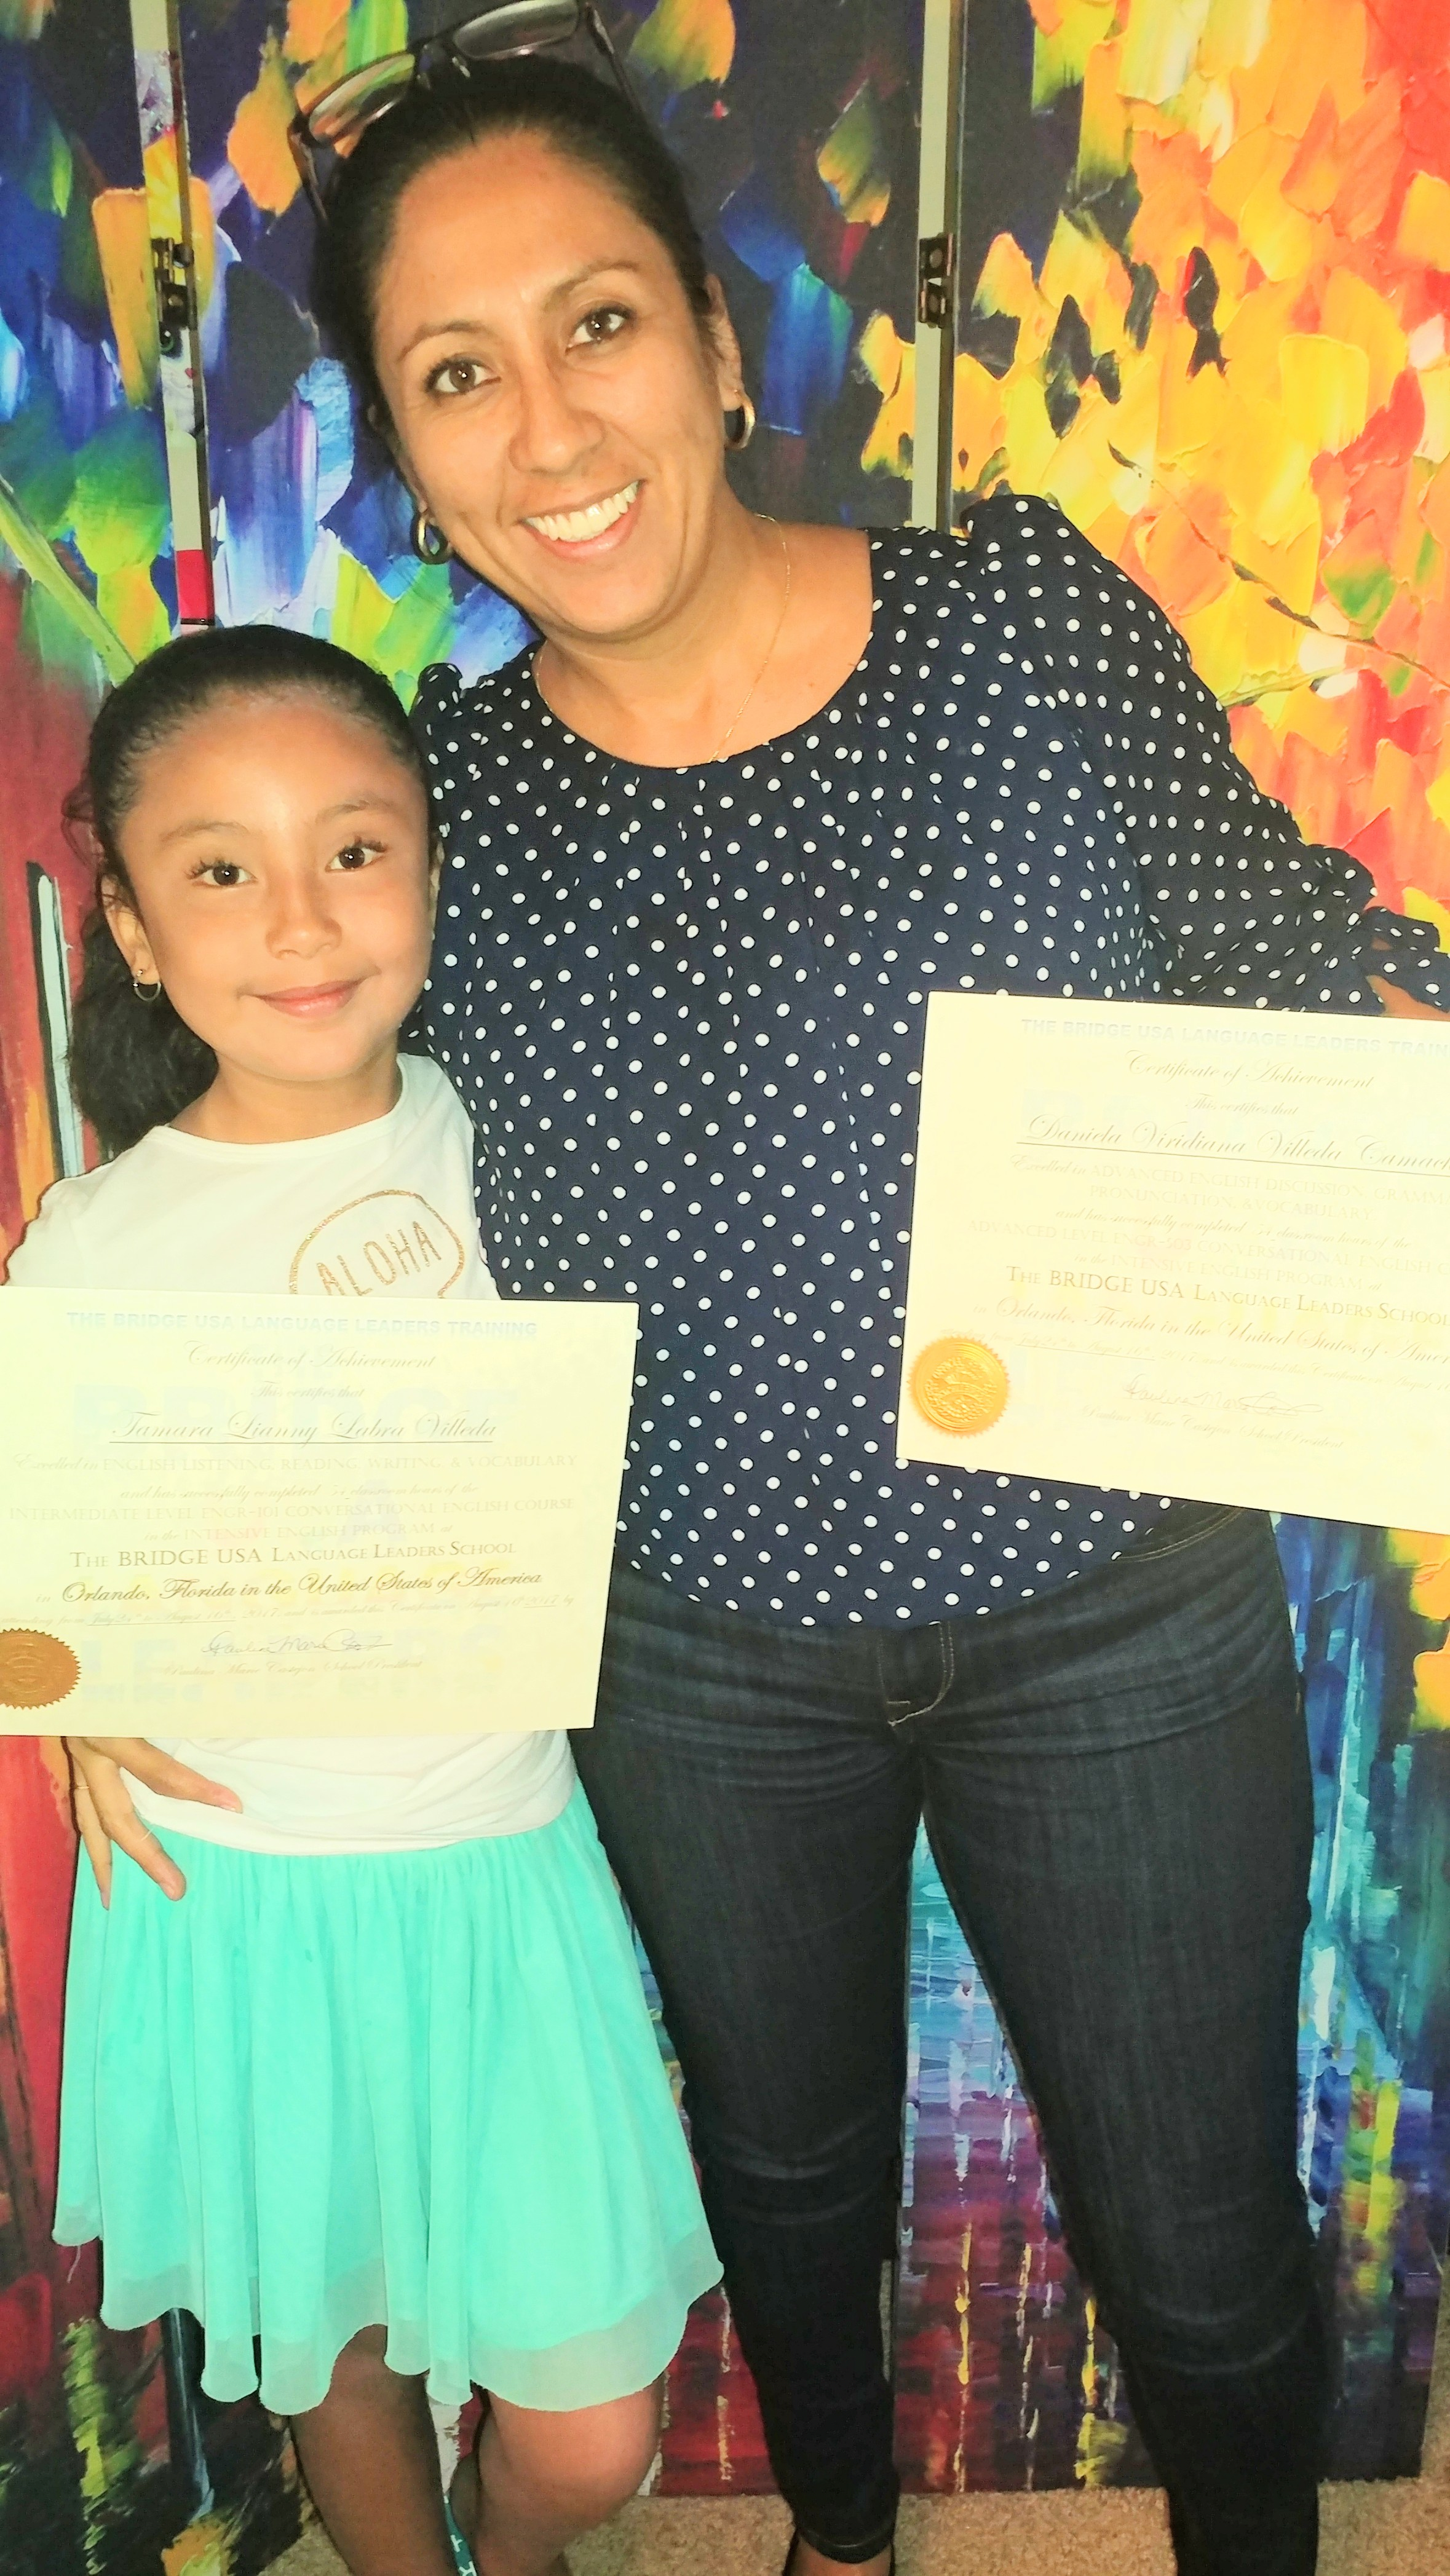 Congratulations Tamara & Daniela